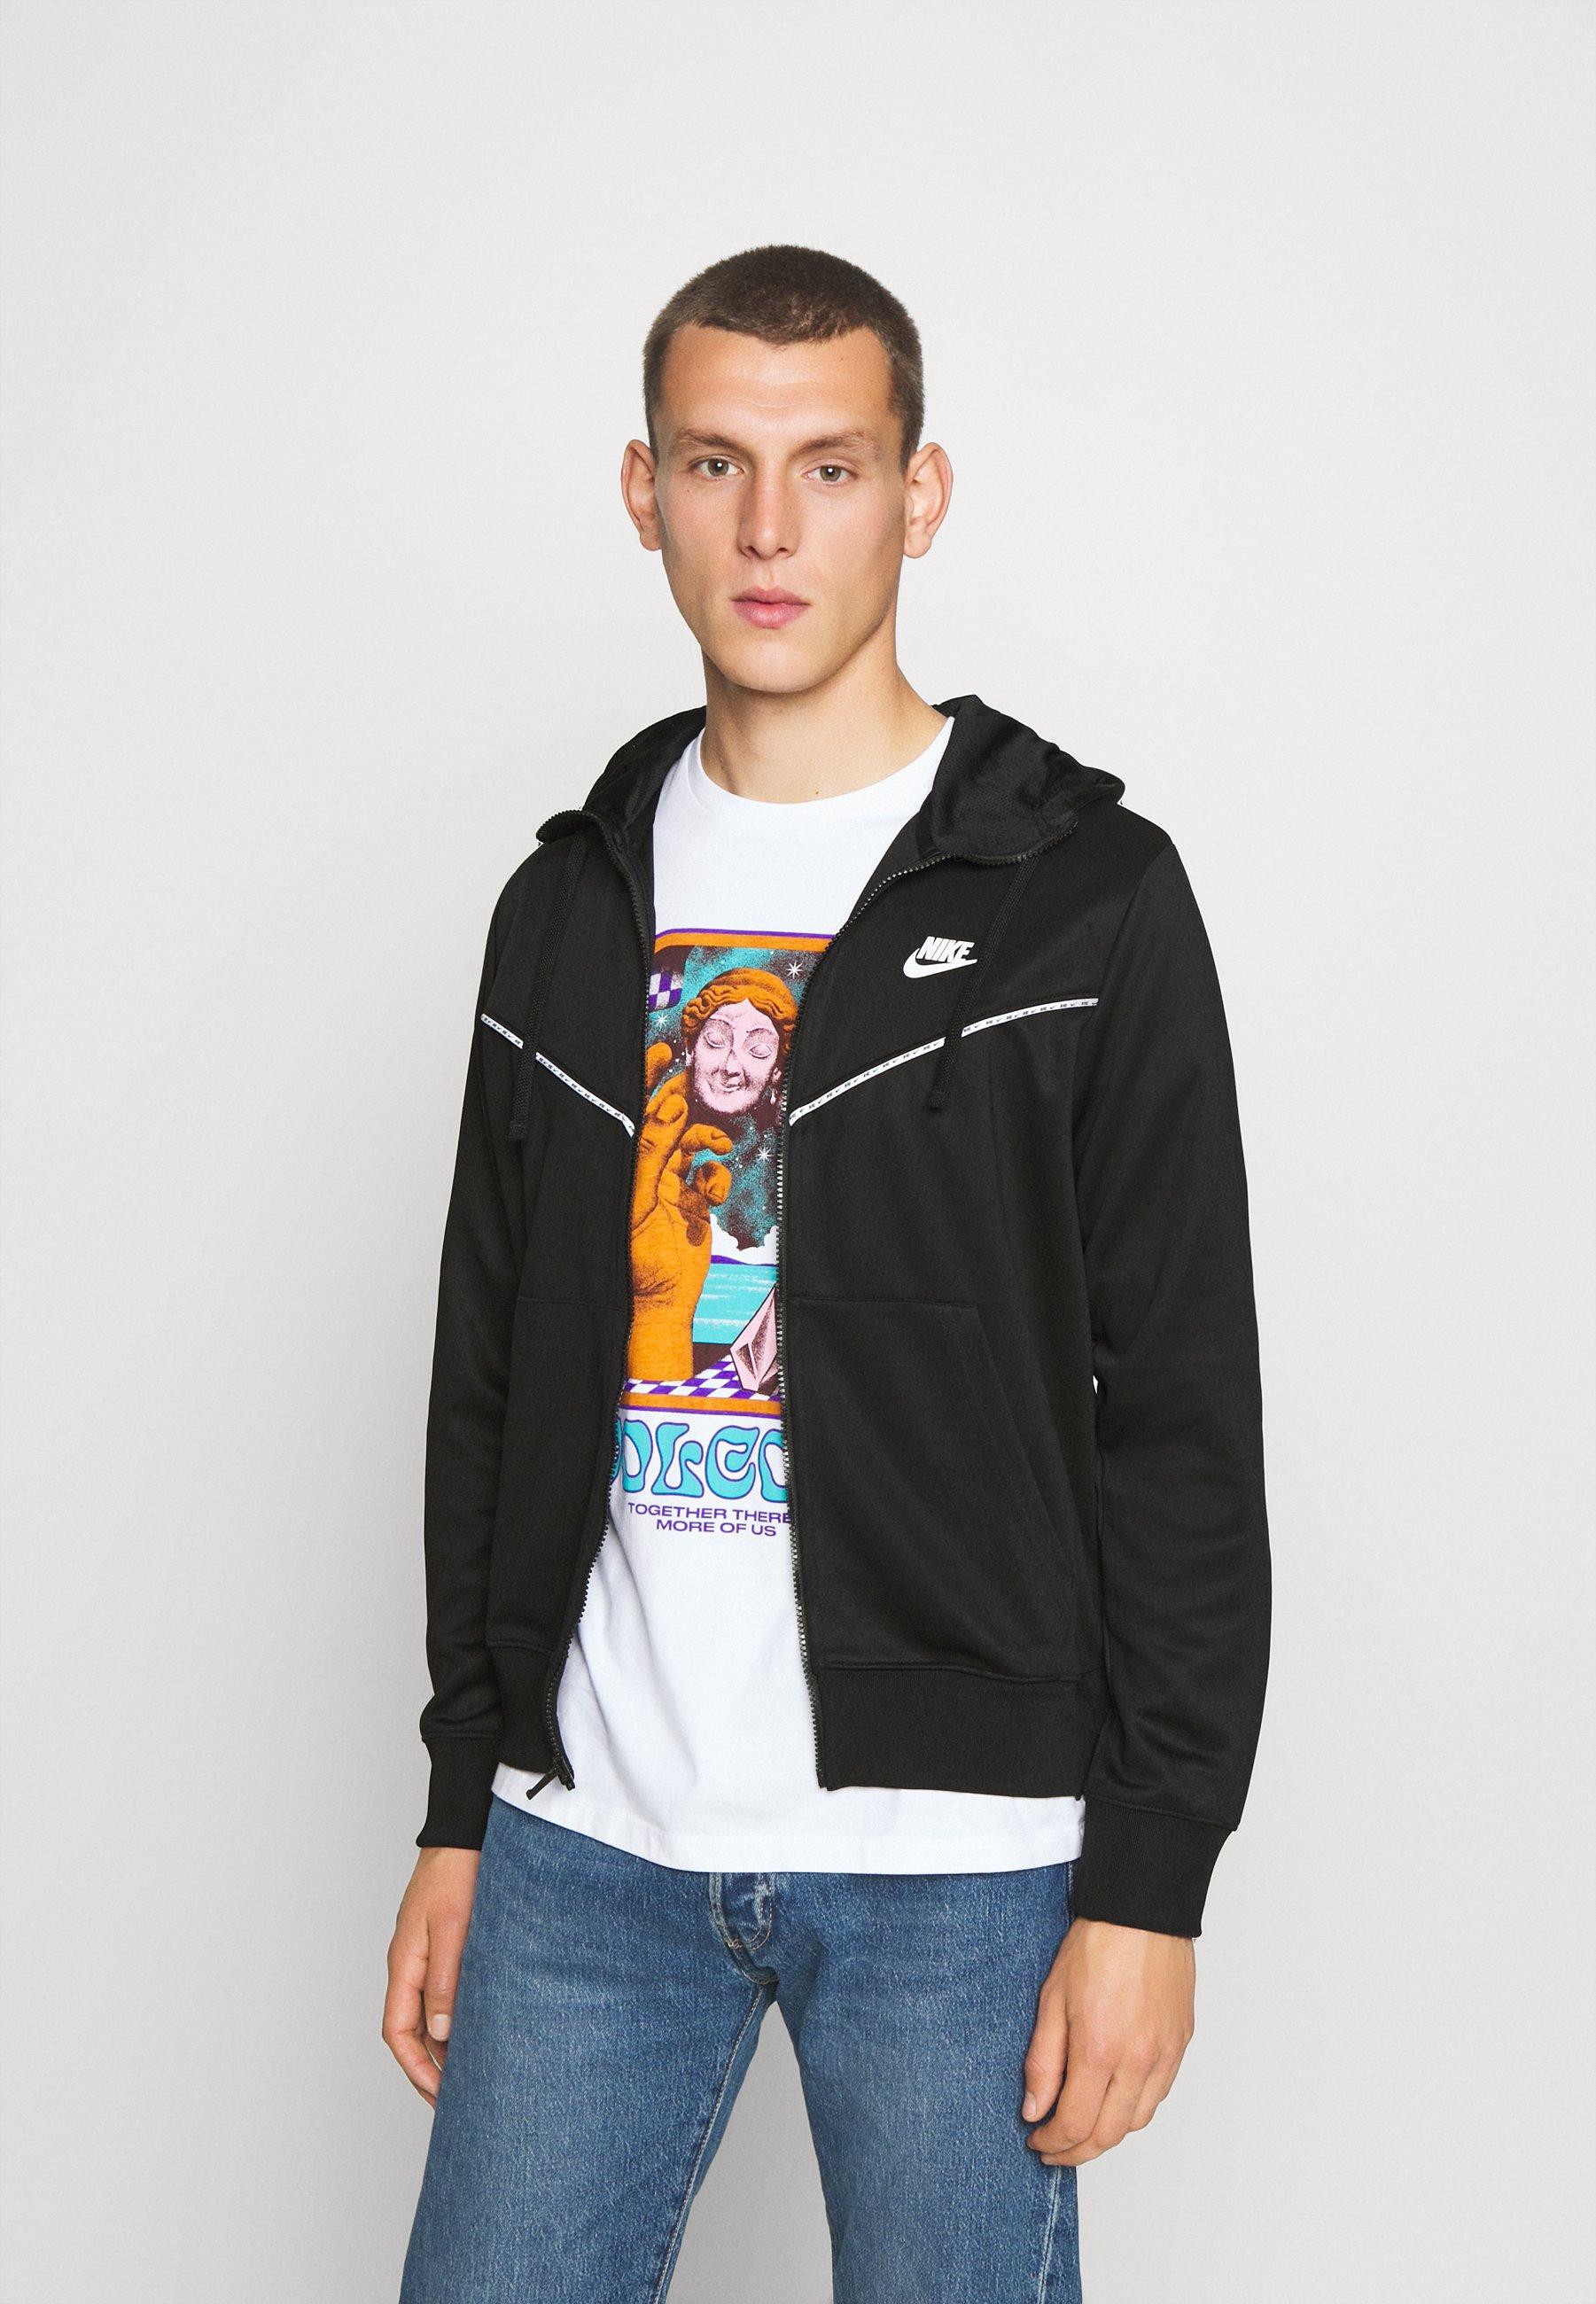 Fast Express Outlet Men's Clothing Nike Sportswear REPEAT HOODIE Zip-up hoodie black xd4e9fJNo DUcuJbfm0